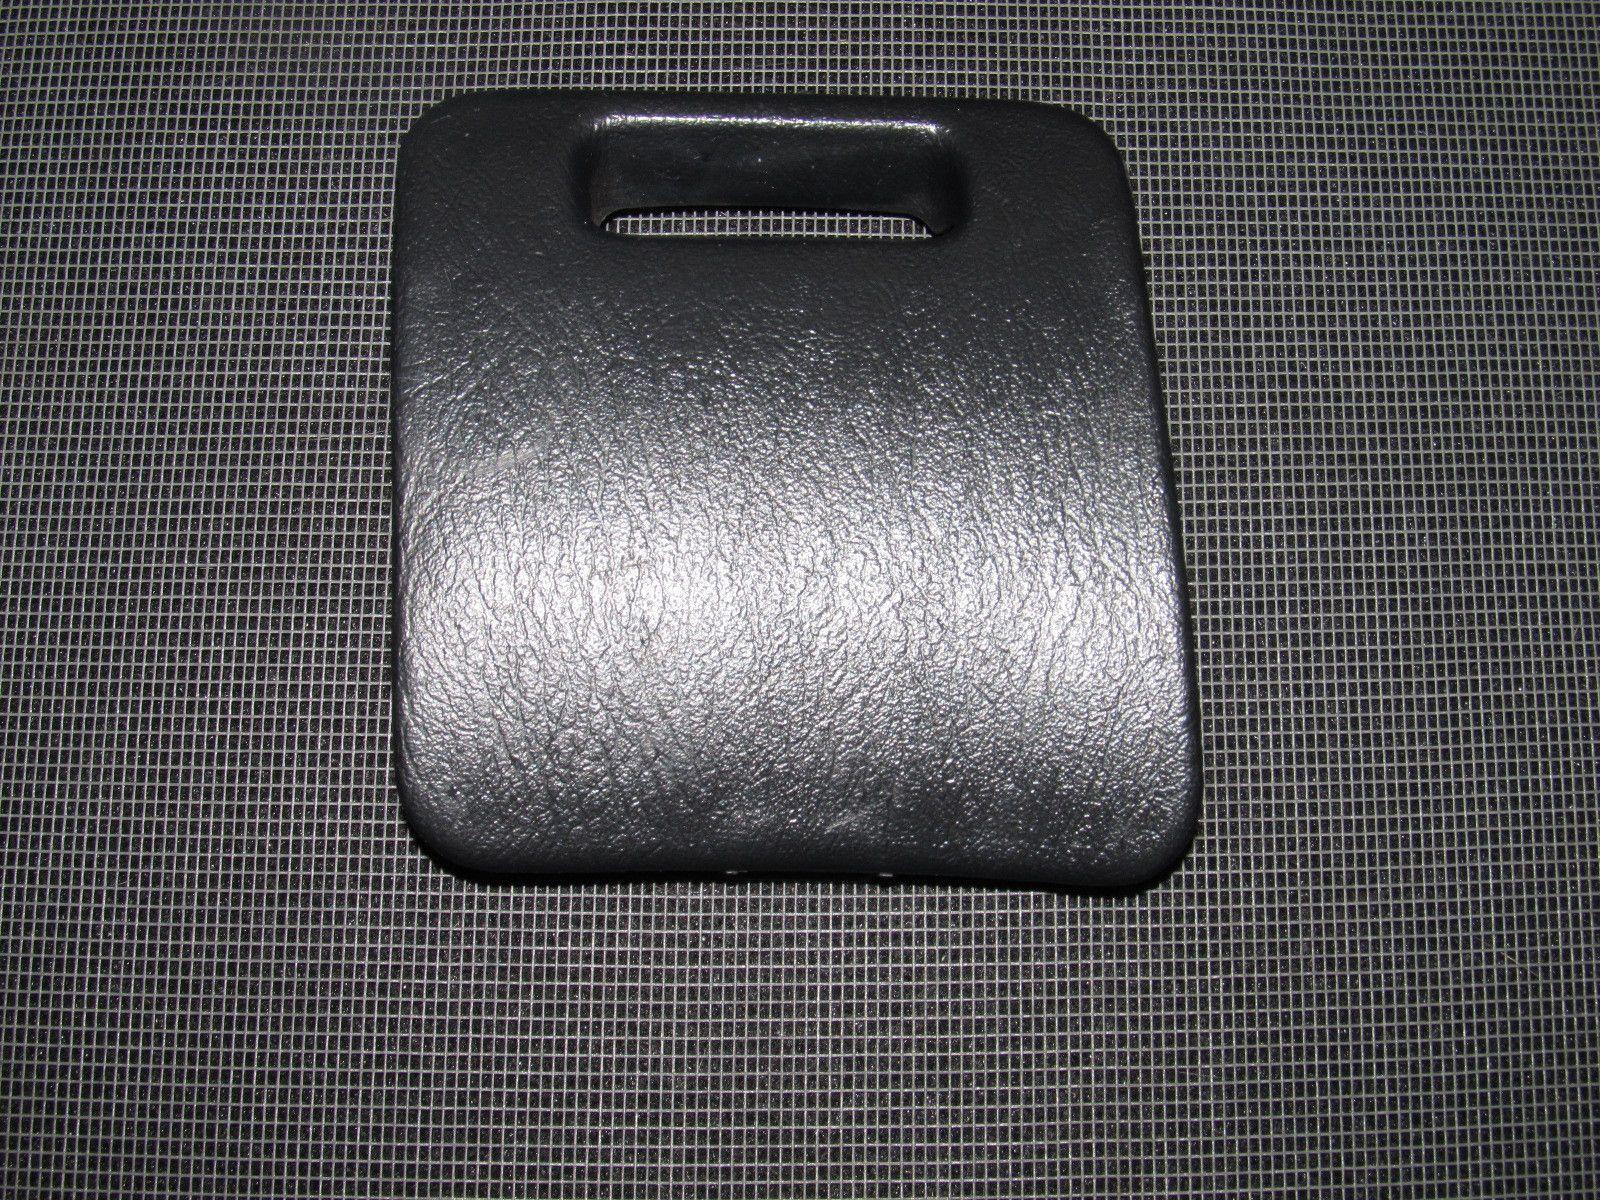 94 95 96 97 98 99 toyota celica oem interior fuse box cover [ 1600 x 1200 Pixel ]